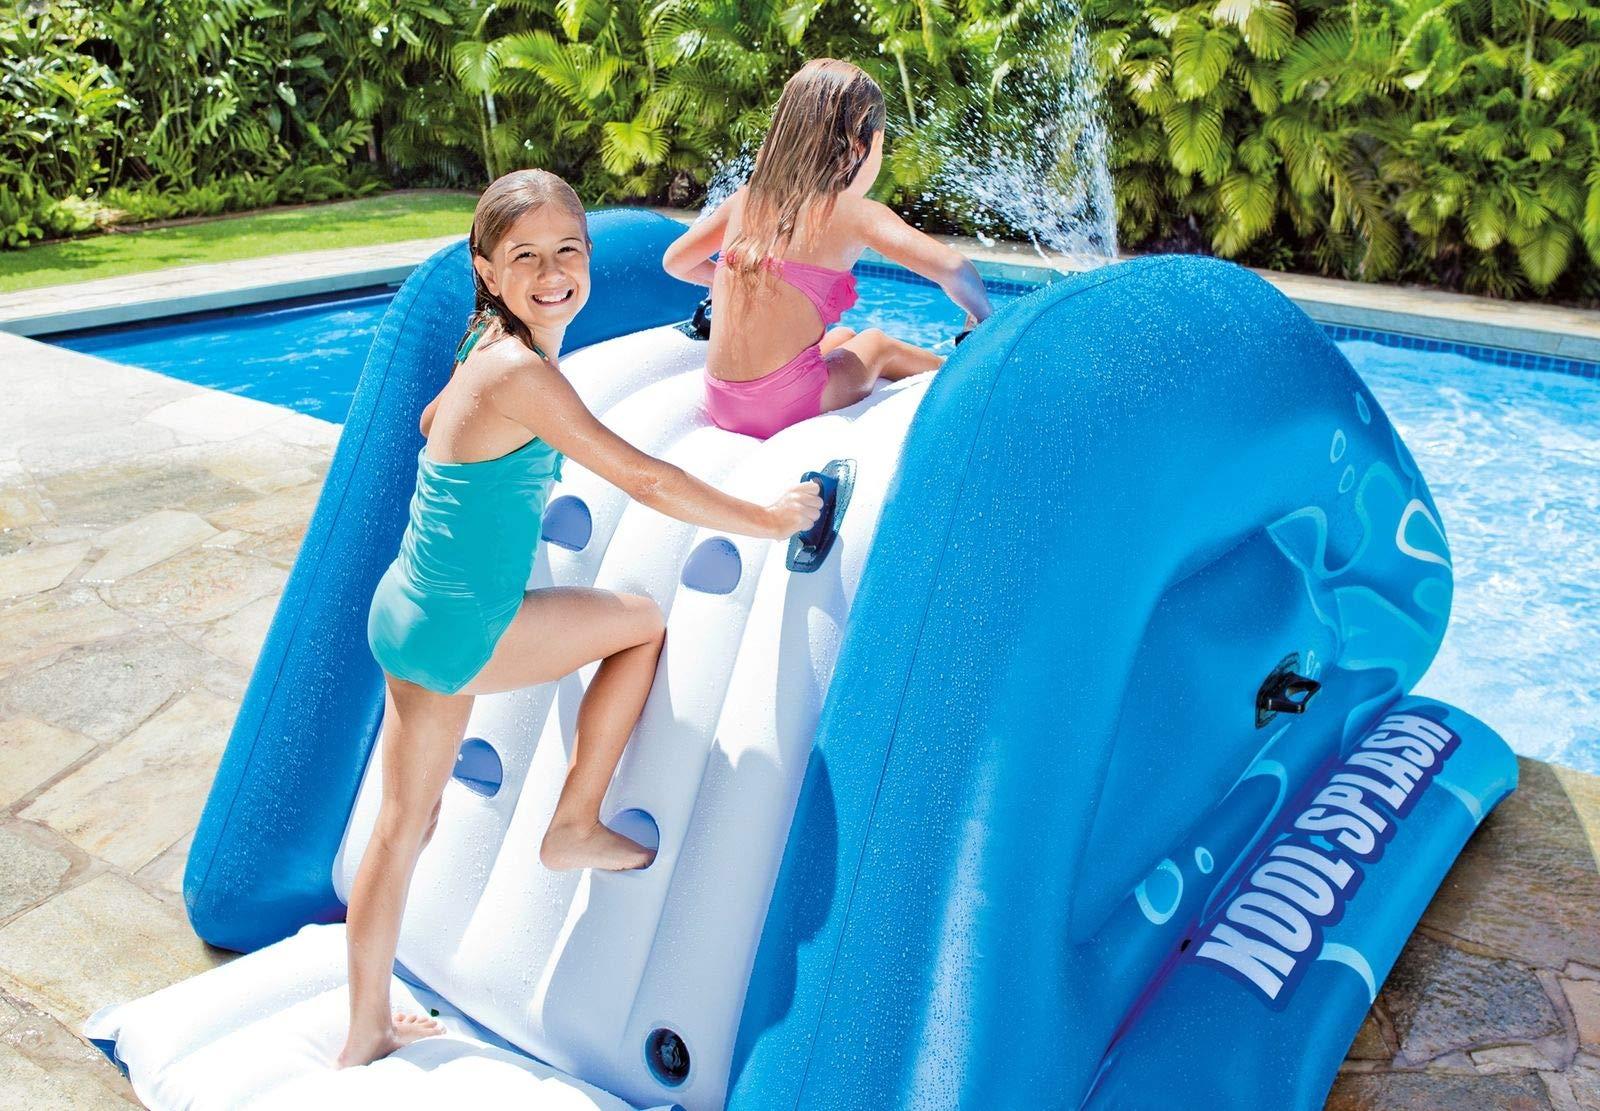 Alek...Shop Water Slide Accessory Play Swimming Pool Inflatable Splash Slide Kids Easy Fun Game Family Center Slide by Alek...Shop (Image #5)